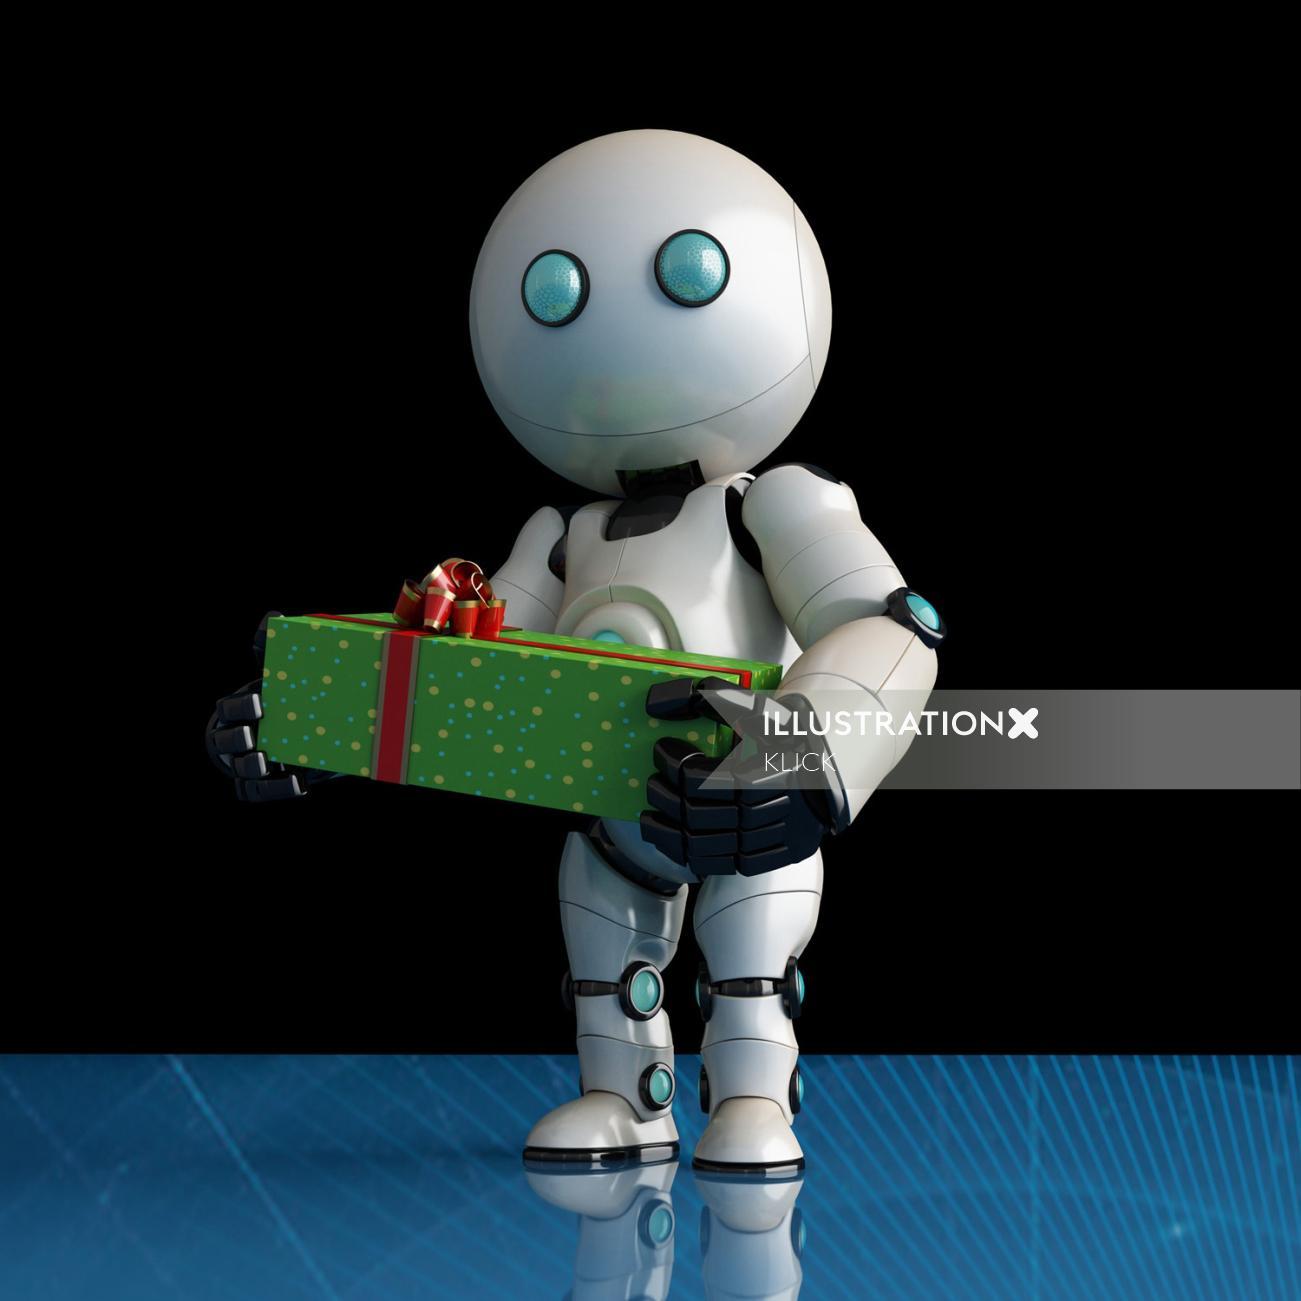 Graphic design of cute robot